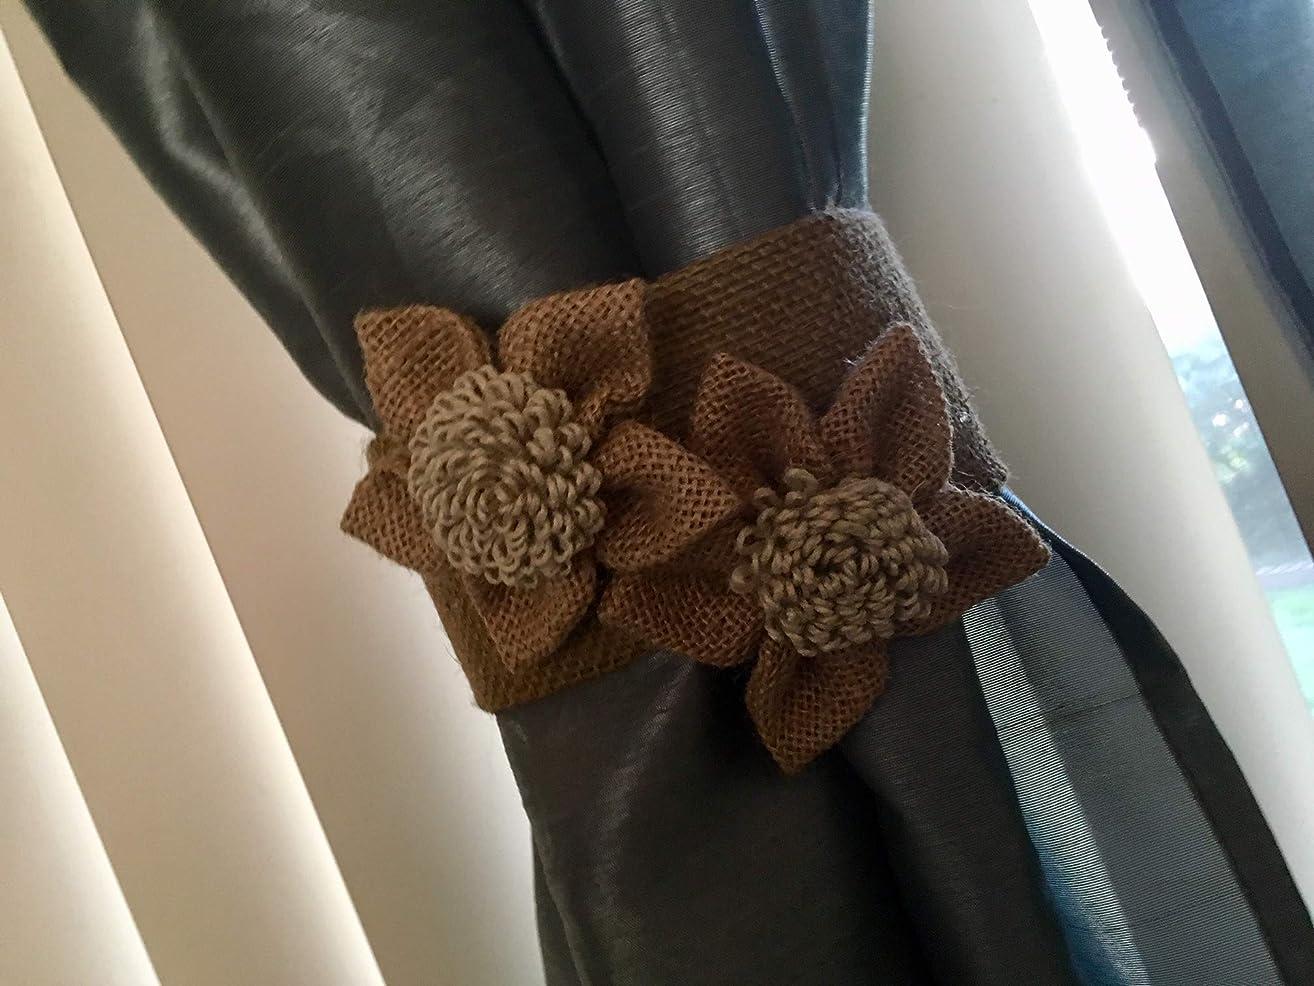 Burlap Curtain Rope Tieback, Natural Cotton handmade Black/Burlap flowers home decore Curtain tie back,2pcs Shabby chic curtains,Nusery decor,Burlap Curtain Tie Back,Nursery Decor,Girls Curtain